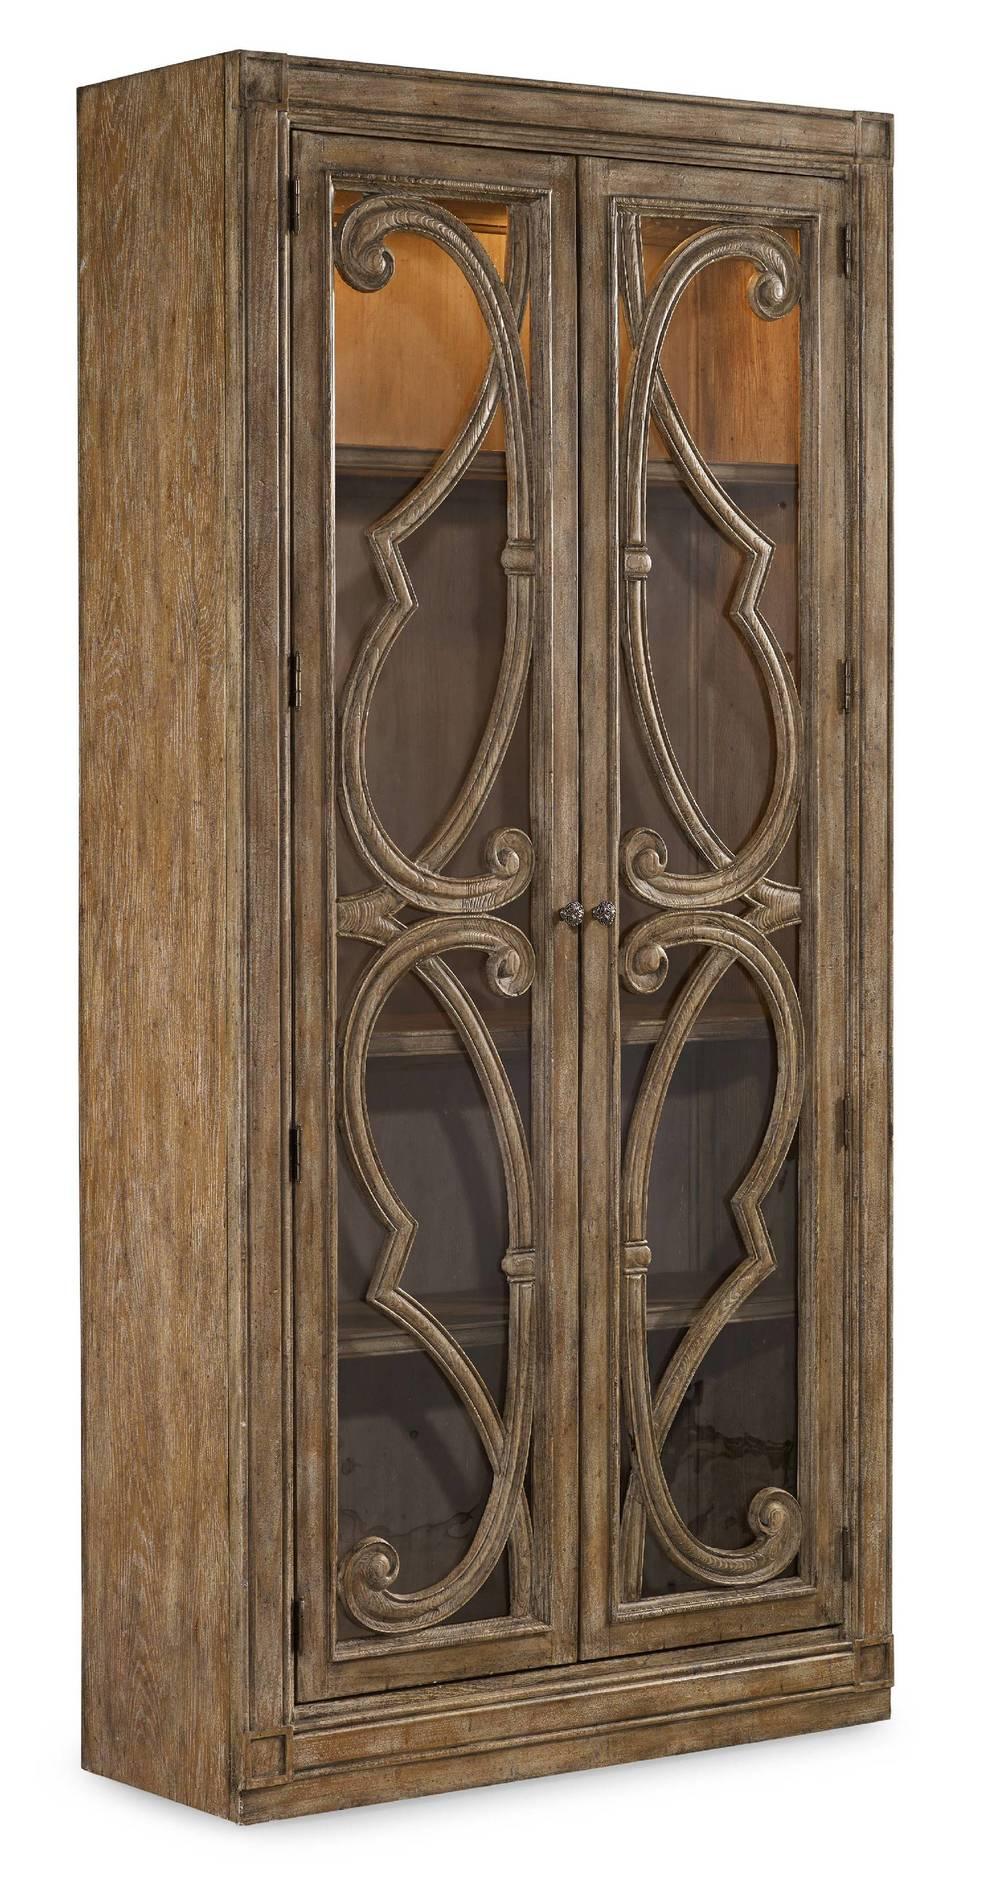 Hooker Furniture - Solana Bunching Curio Cabinet